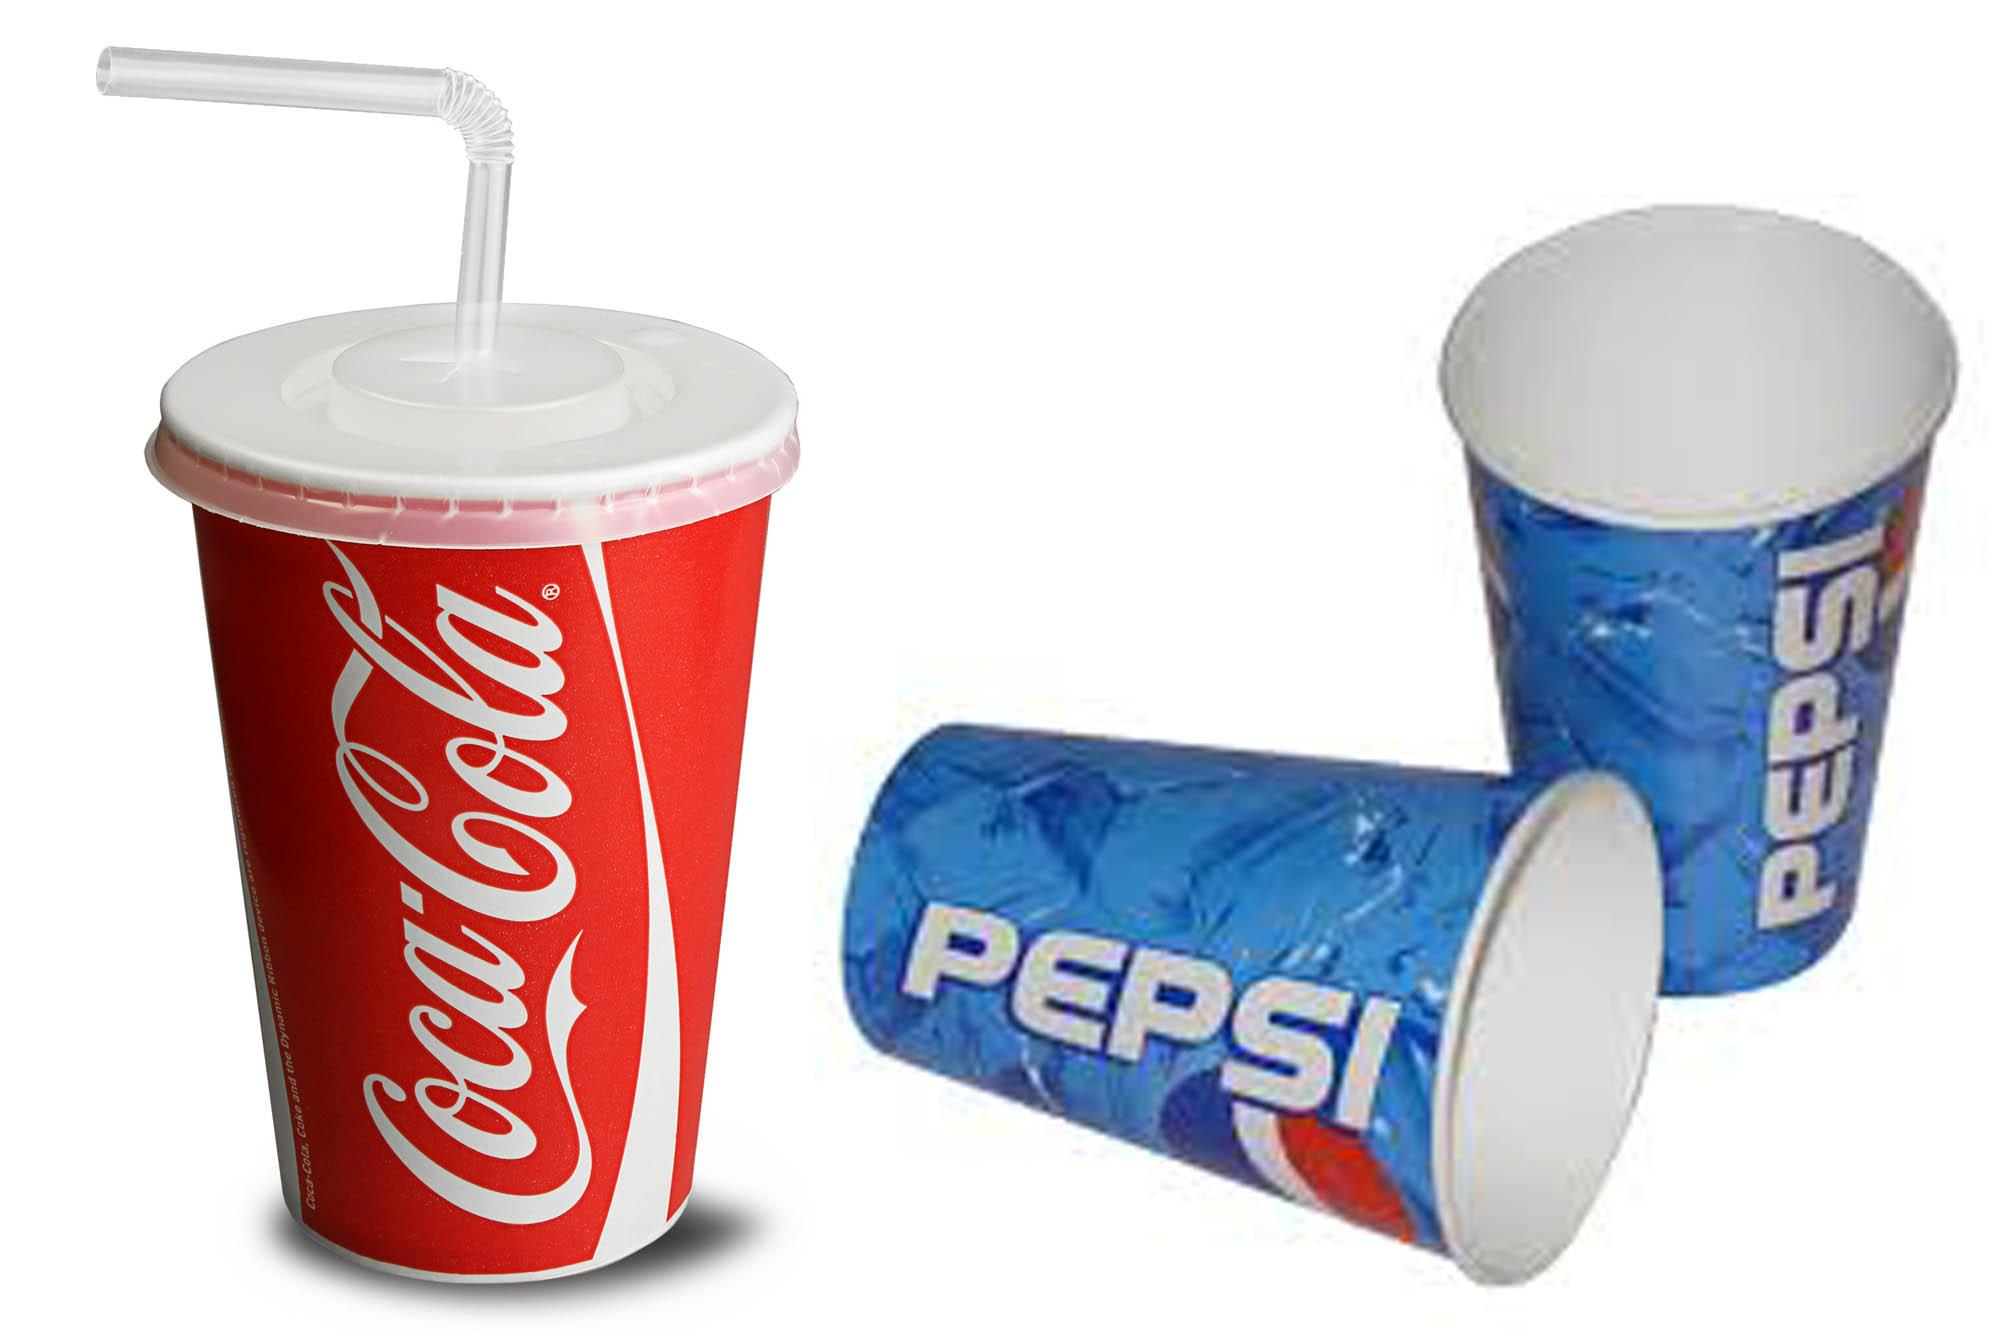 Pepsi coca cola cup